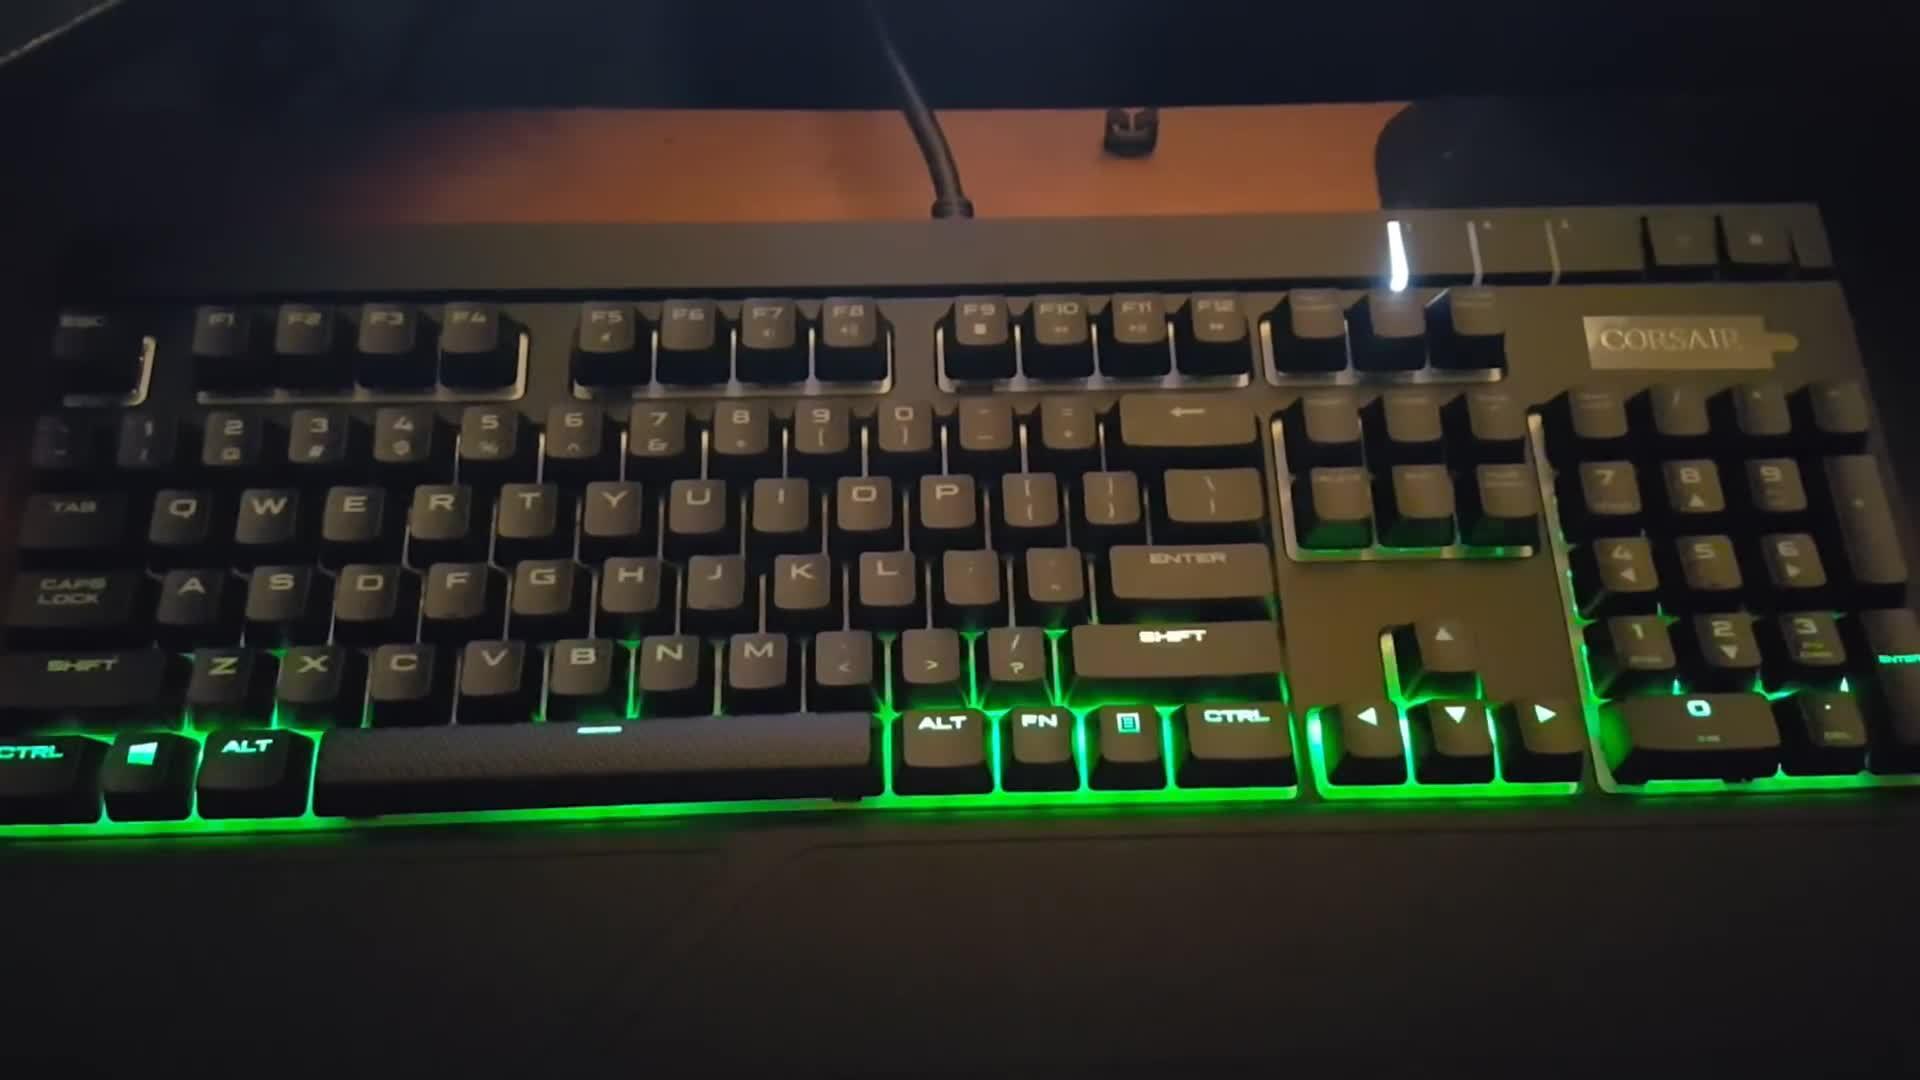 Corsair Gaming K70 Rgb Keyboard Gifs Search | Search & Share on Homdor